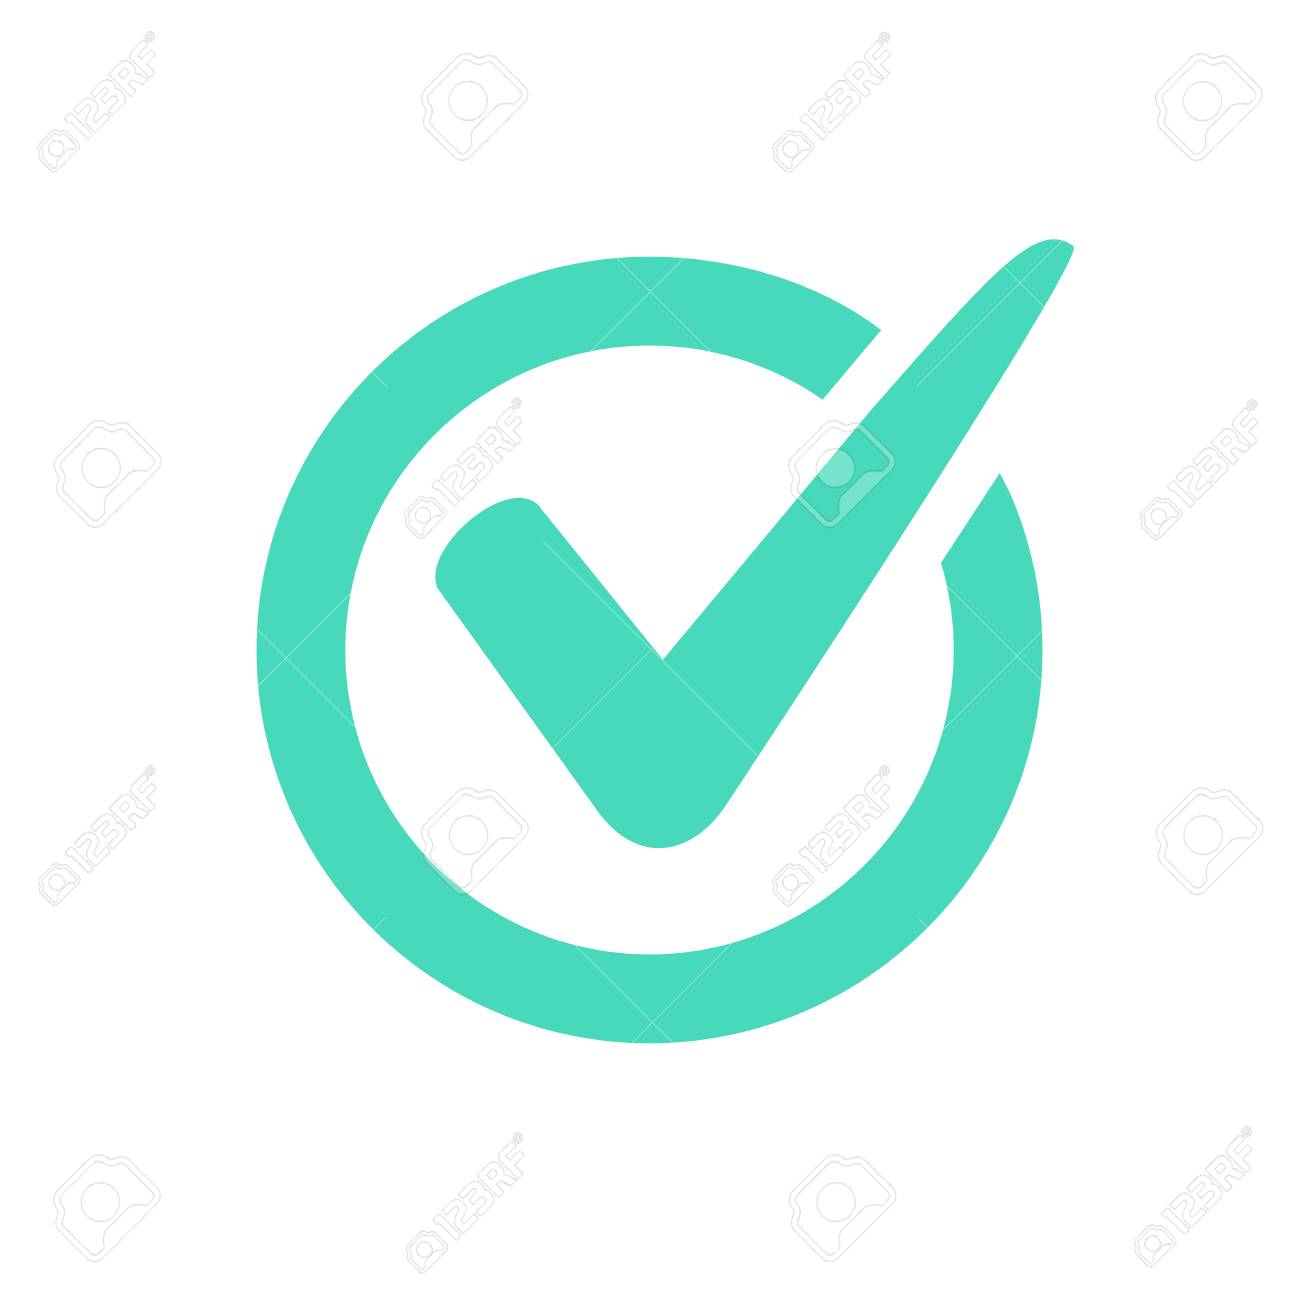 check mark logo vector or icon tick symbol in green color rh 123rf com checkmark logo with yellow circle check mark logo answer